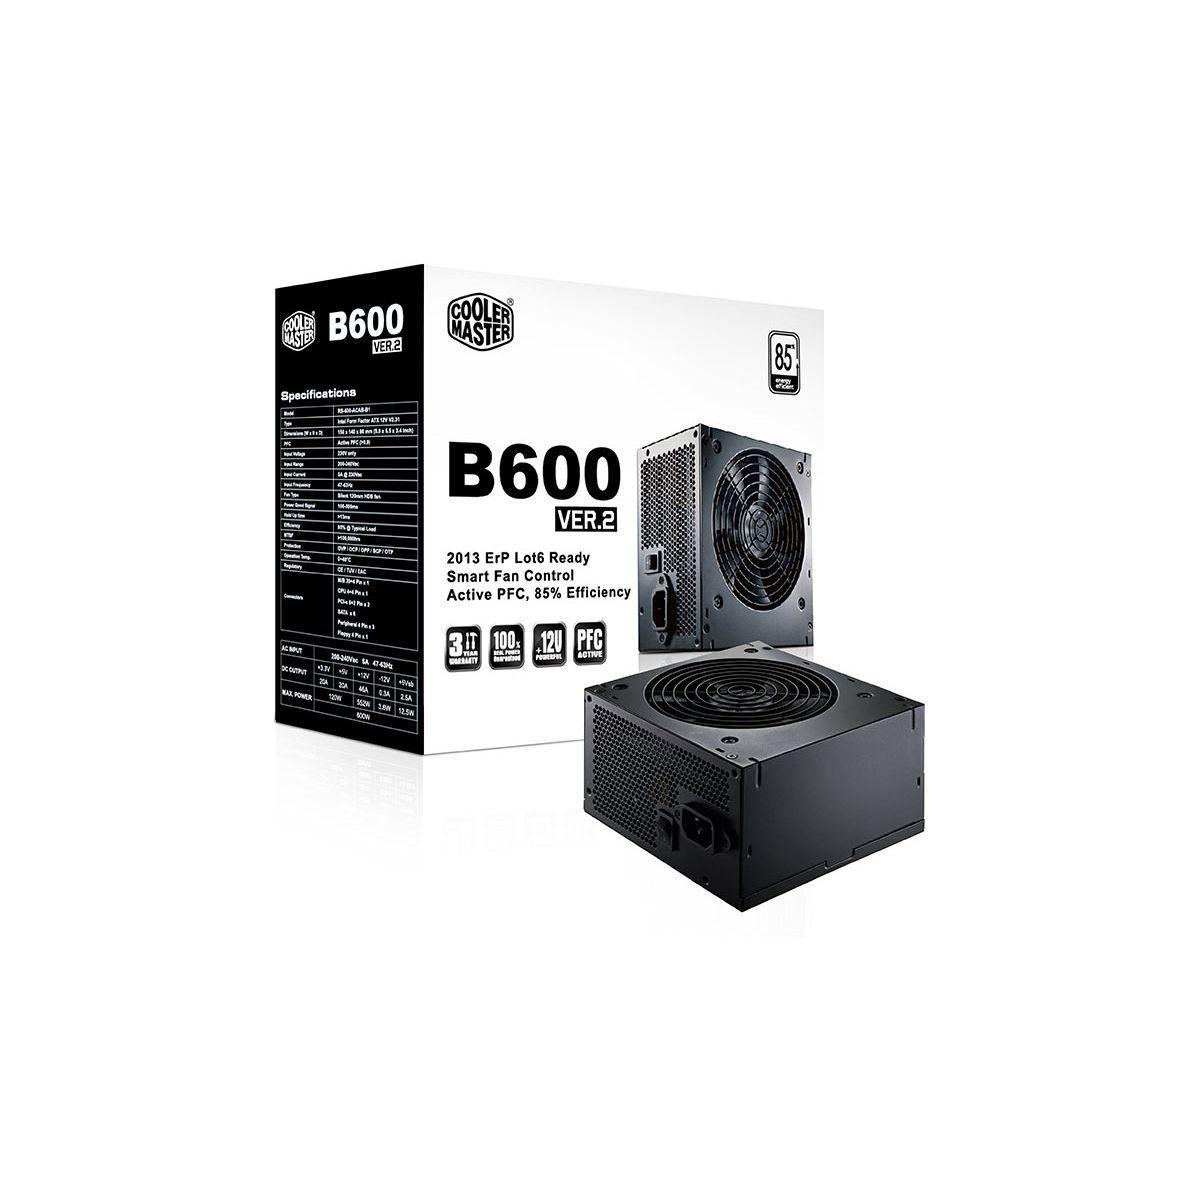 Alimentation cooler master b600 ver.2 atx12v 2.31 - ca 230 v - 2% de remise immédiate avec le code : cool2 (photo)